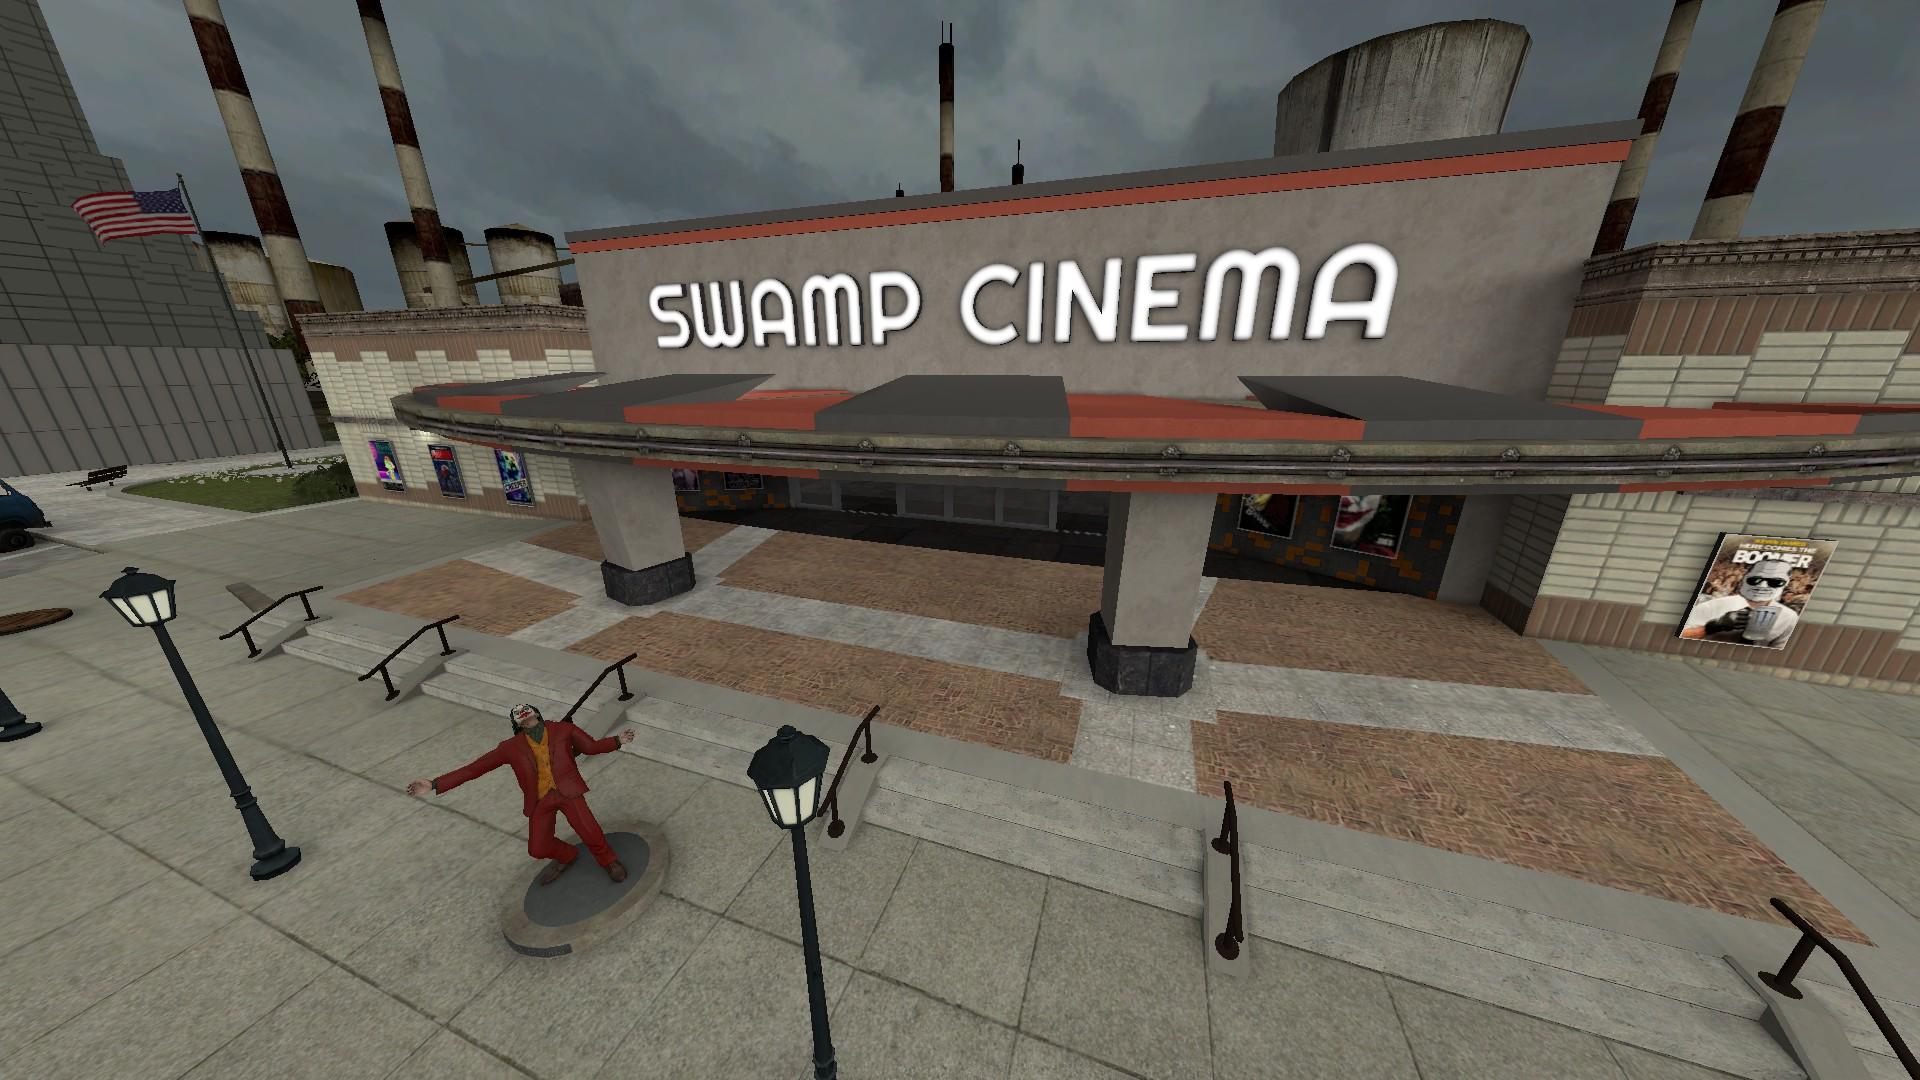 Garry's Mod Server Swamp Cinema + Map + Locations - Overview - Overview of Server: - 08DE1EA